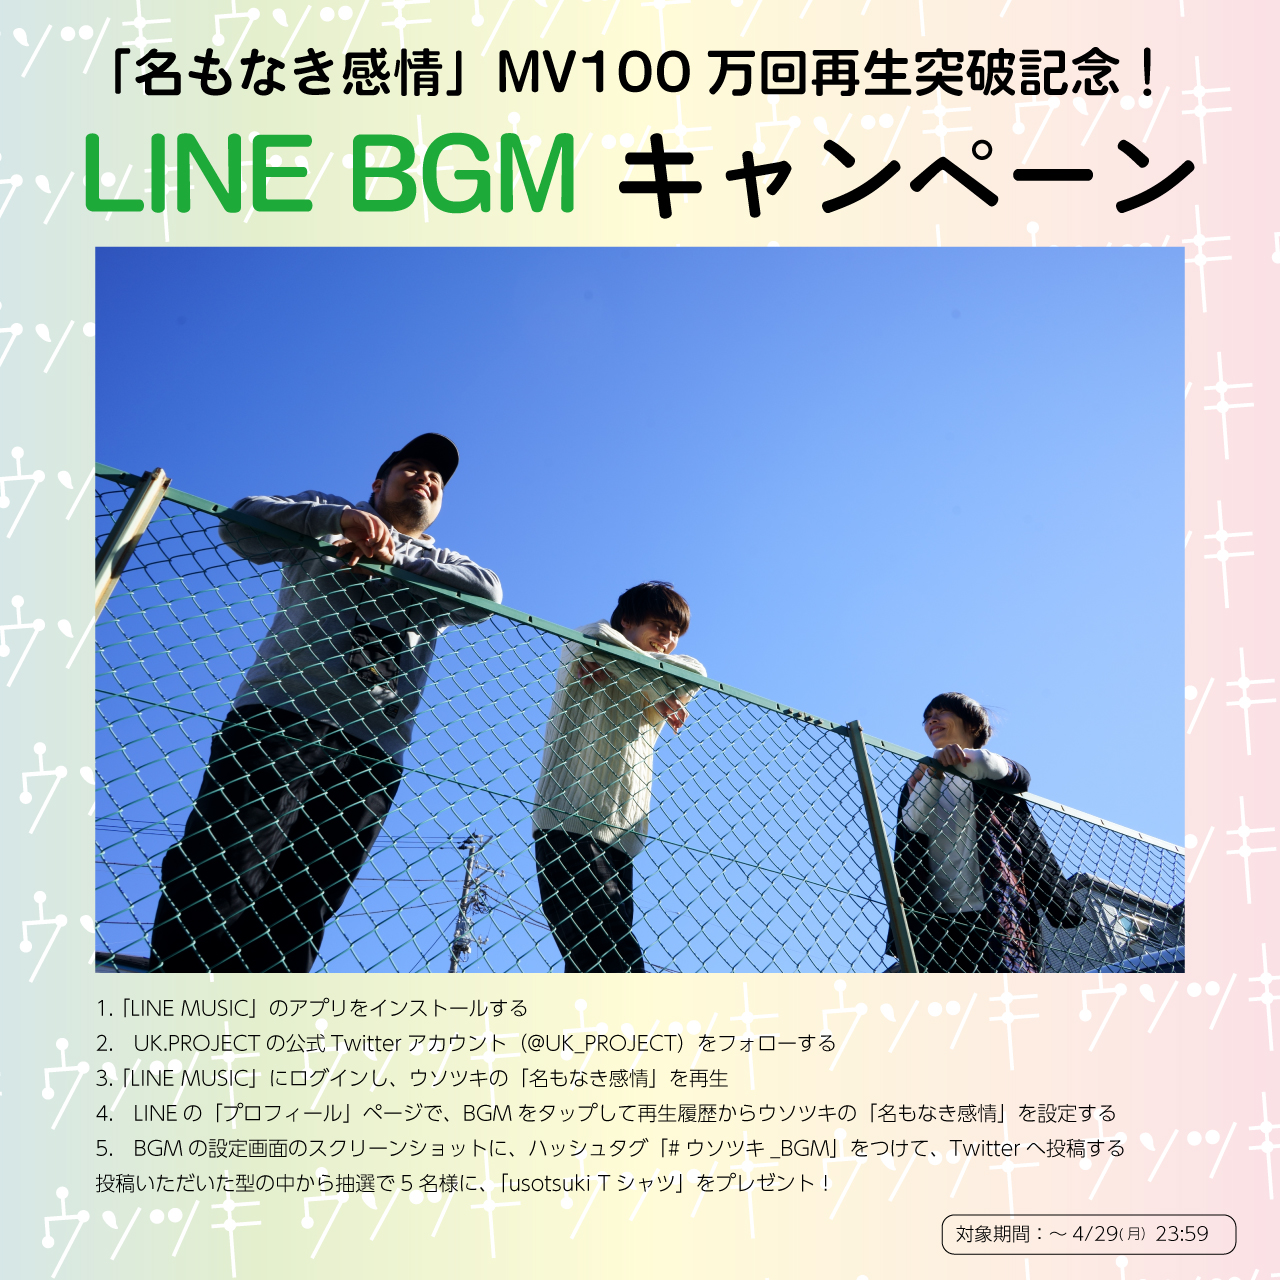 usotsuki_linebgm_OK